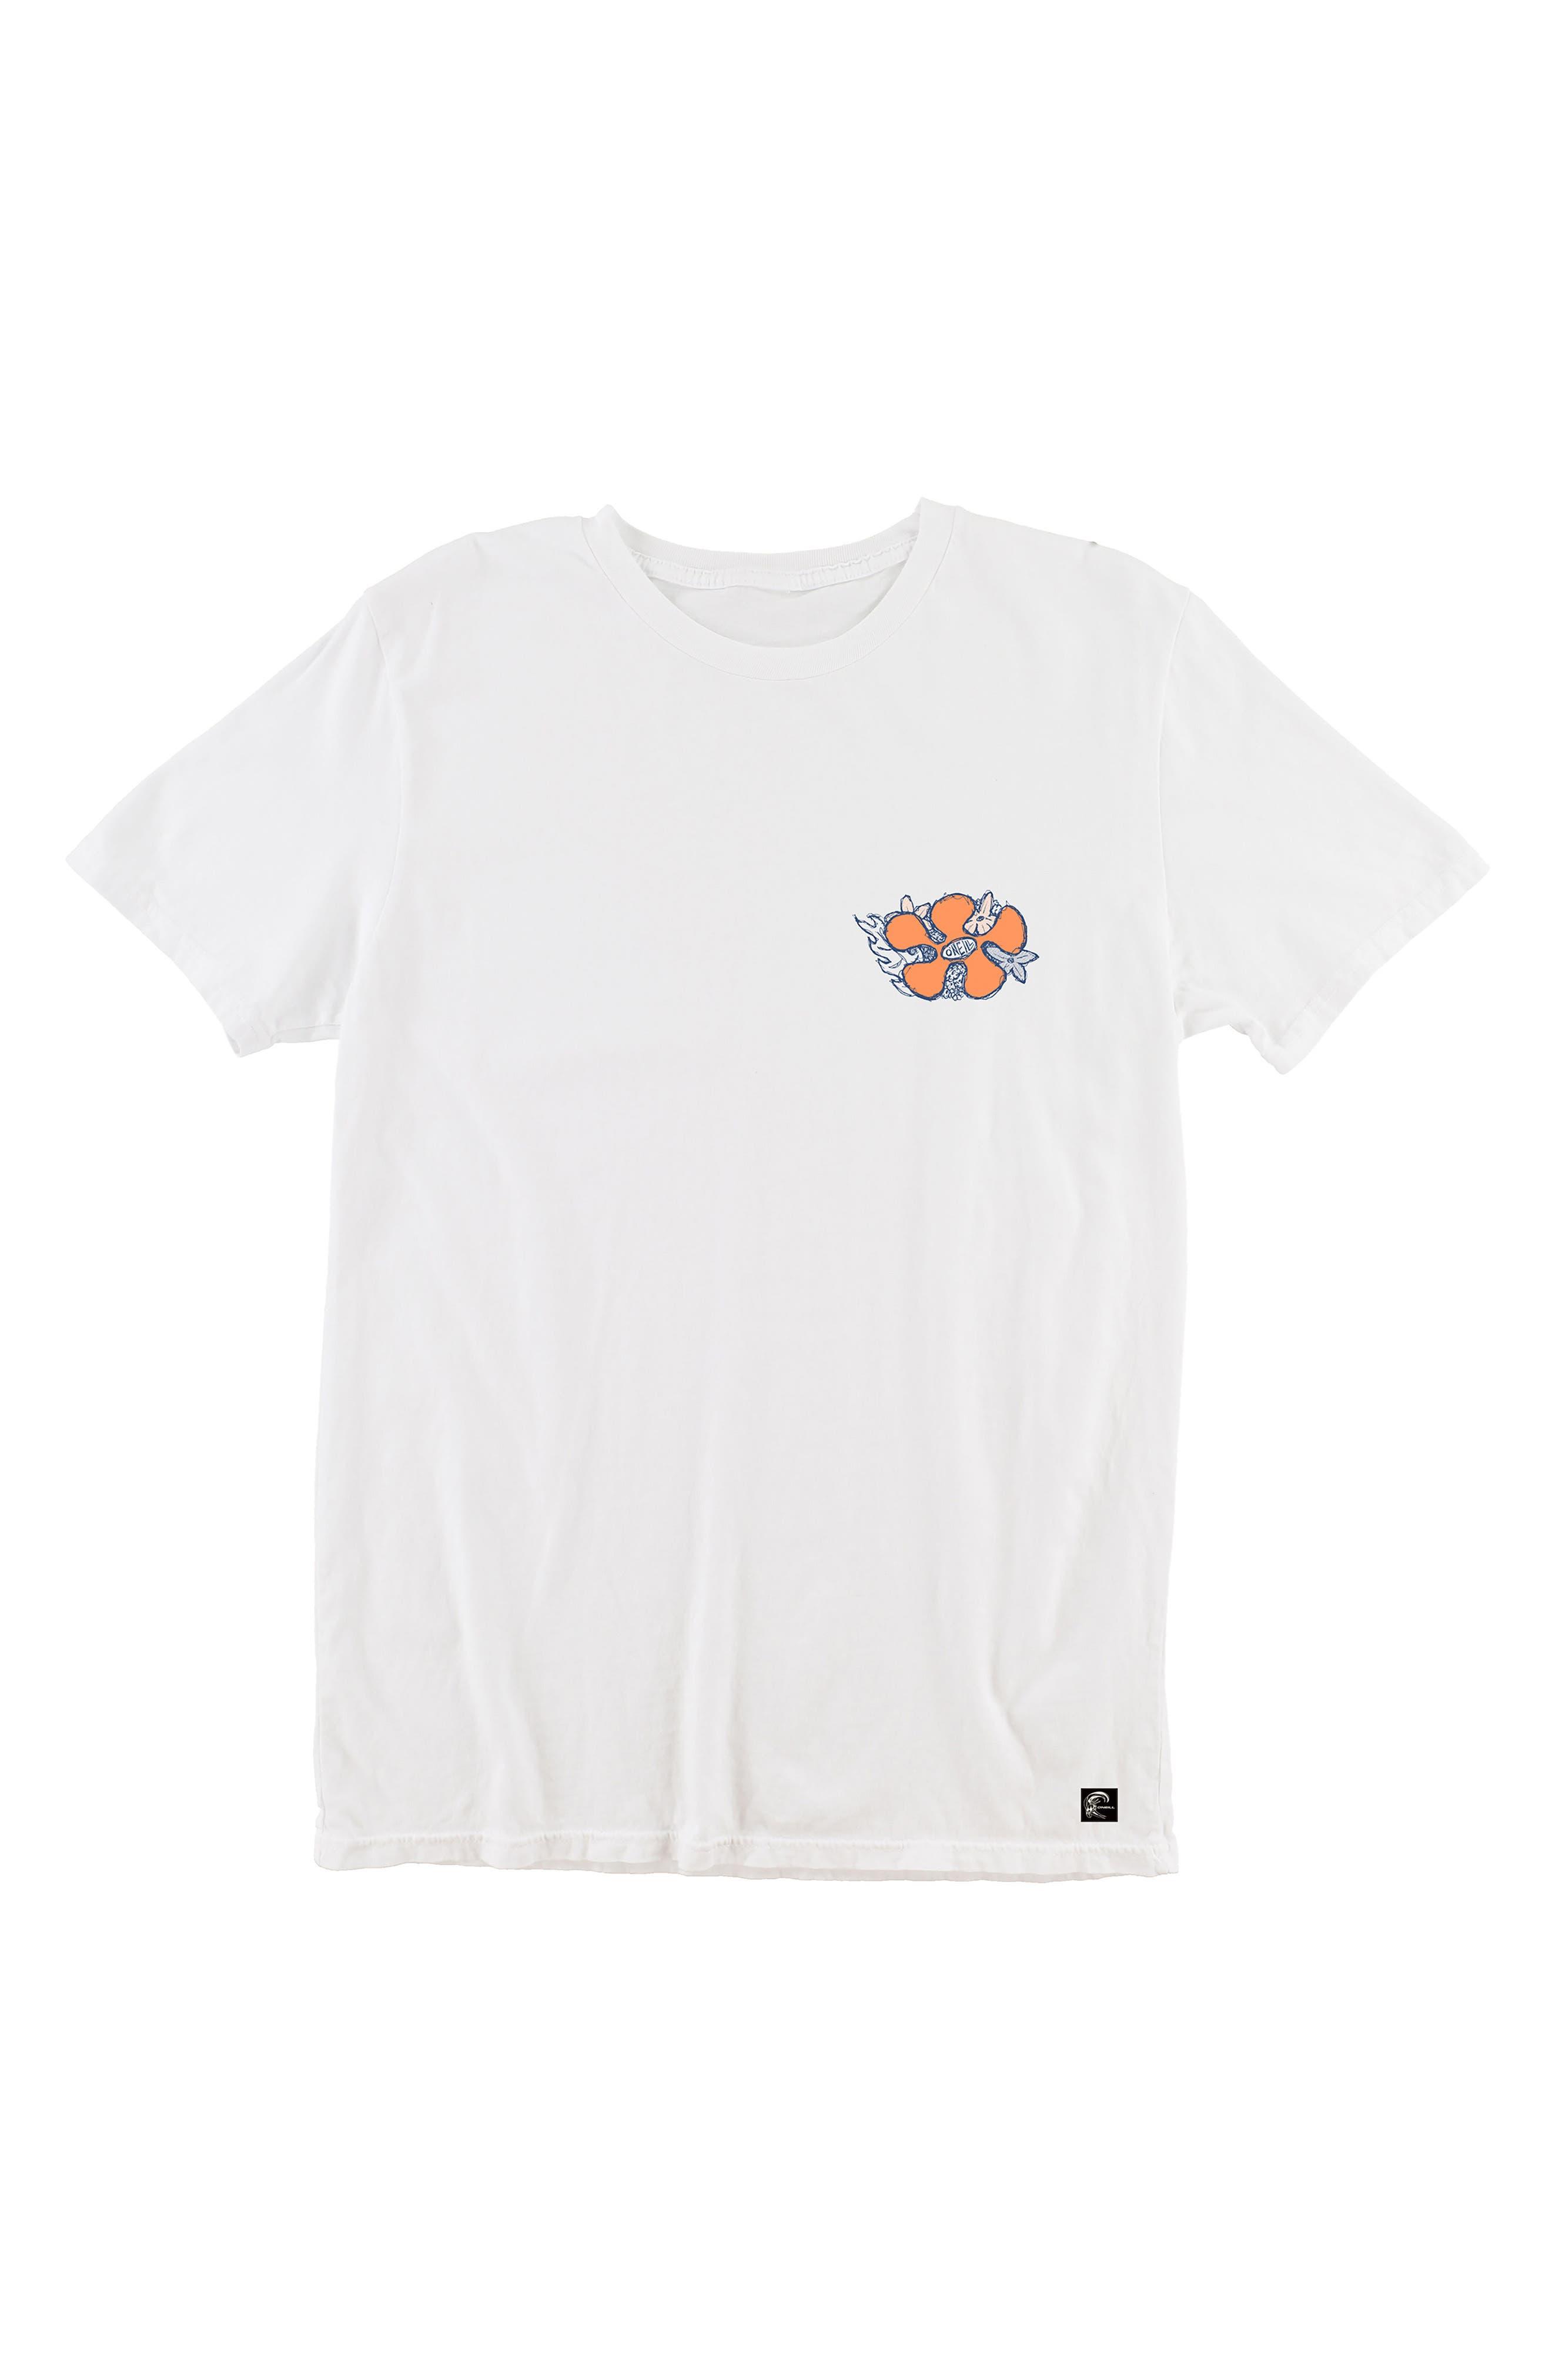 Simich T-Shirt,                             Main thumbnail 1, color,                             White